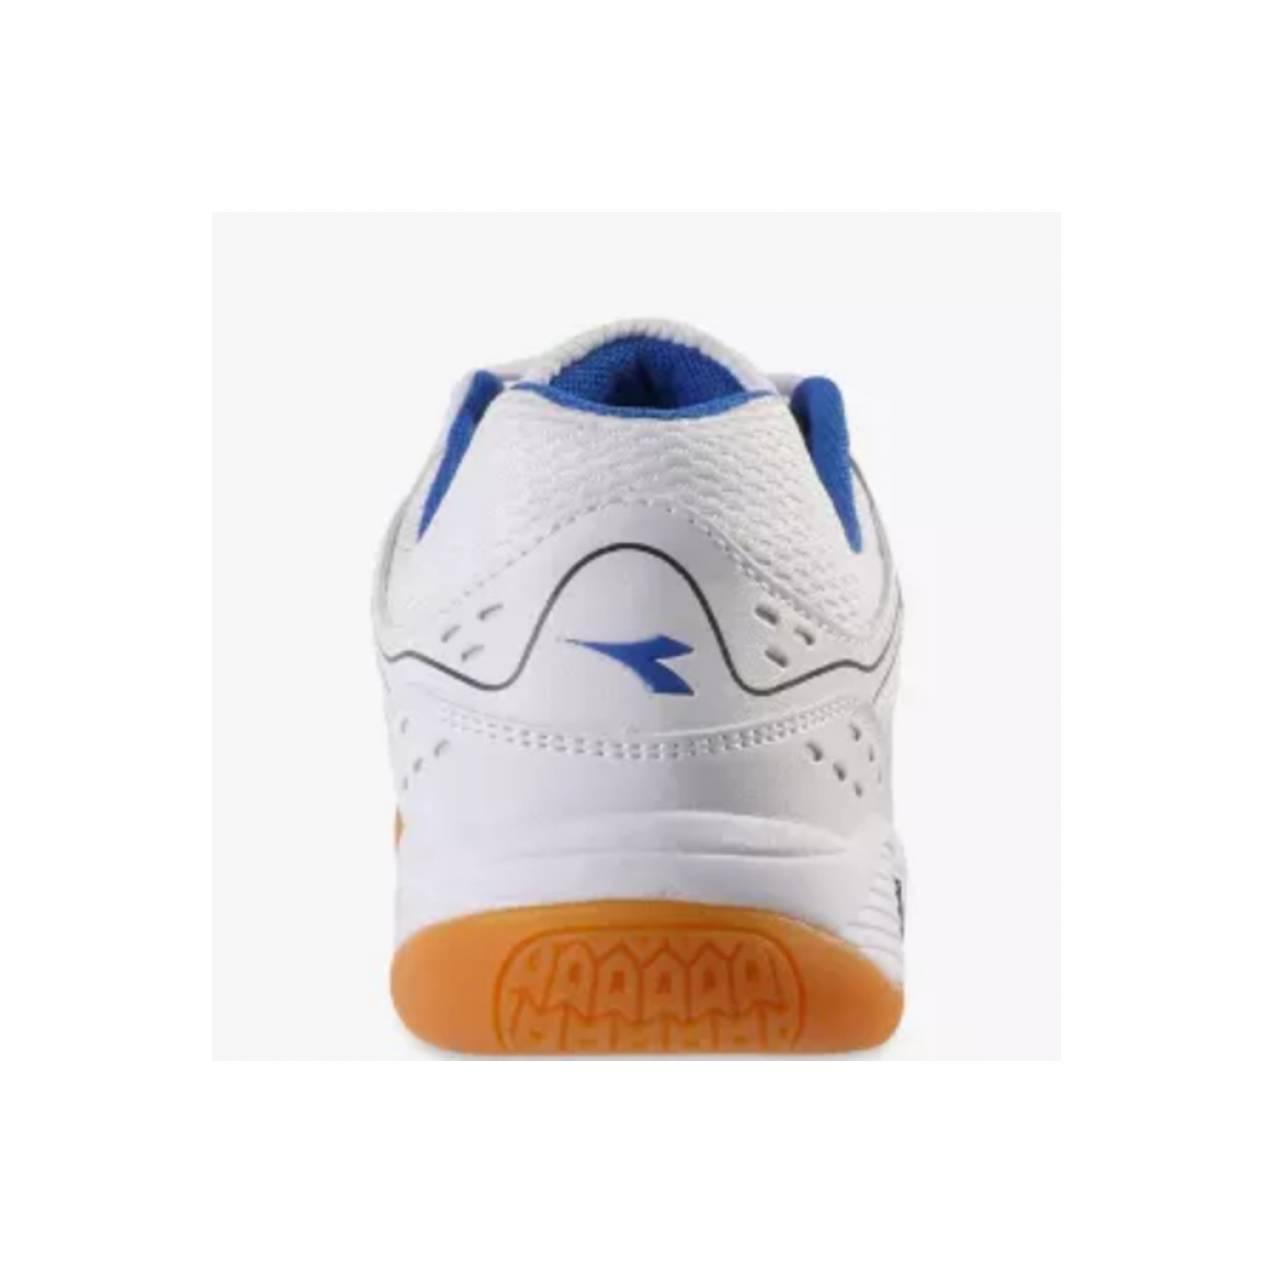 Sepatu DIADORA MARIN, White Blue DIAID7309WBL, Sepatu Badminton